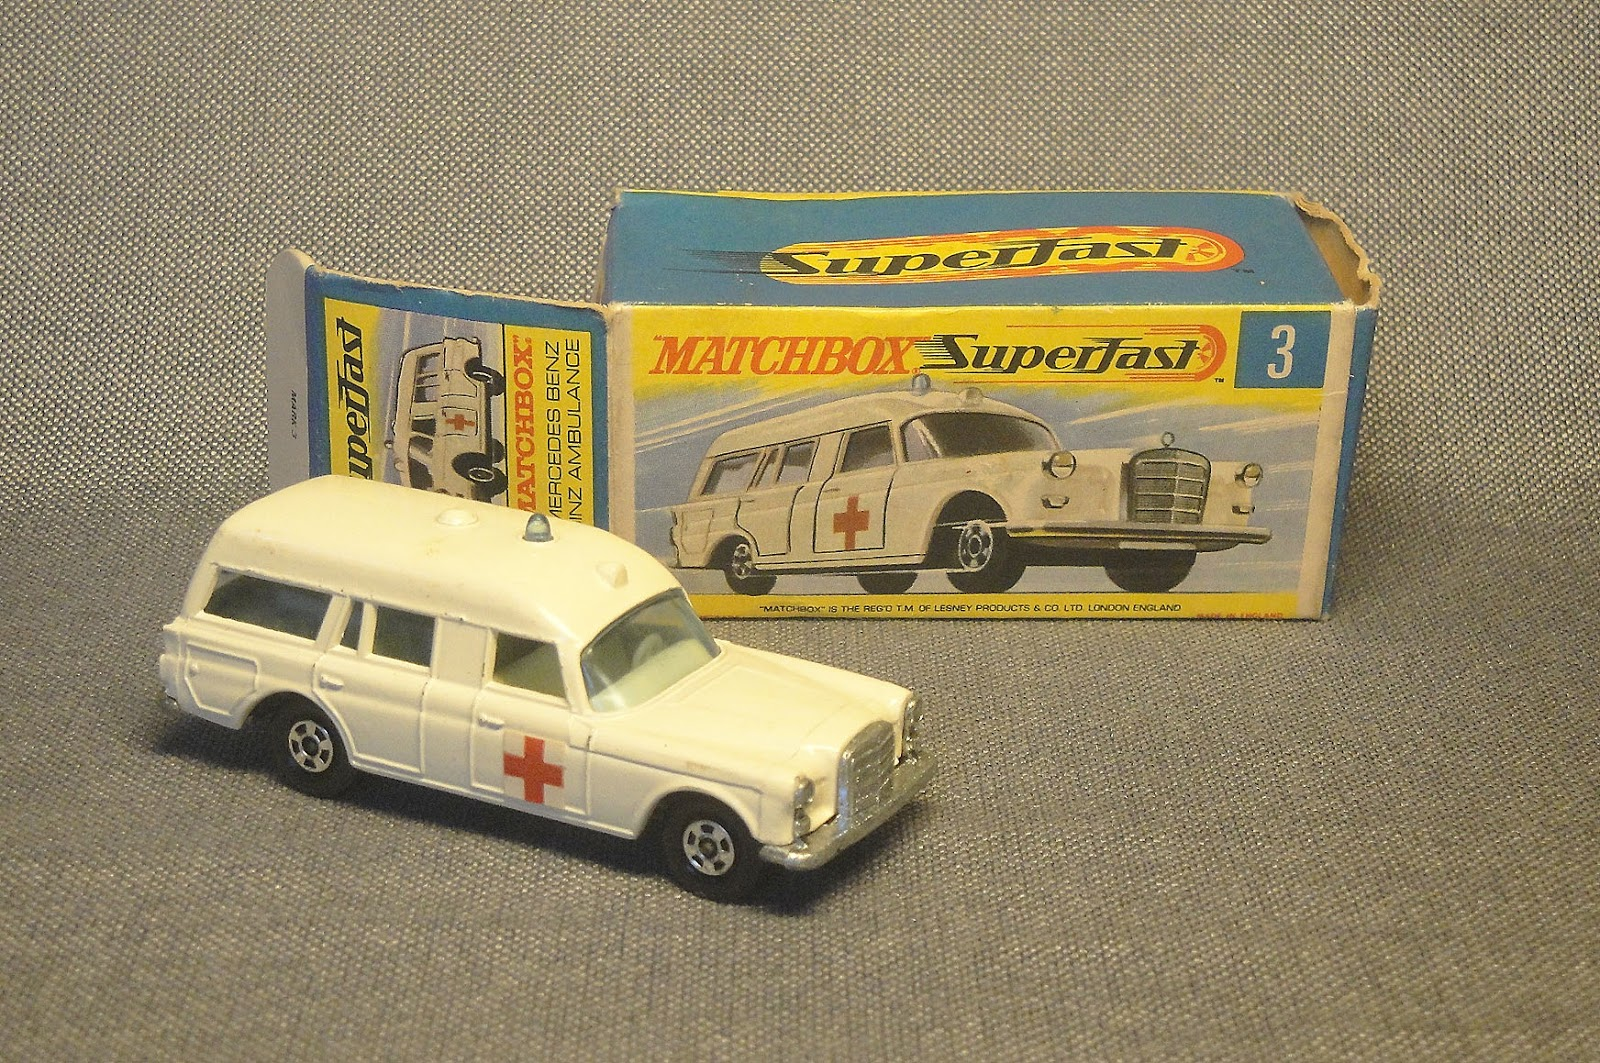 Archivo de autos: Ambulancia Mercedes Superfast